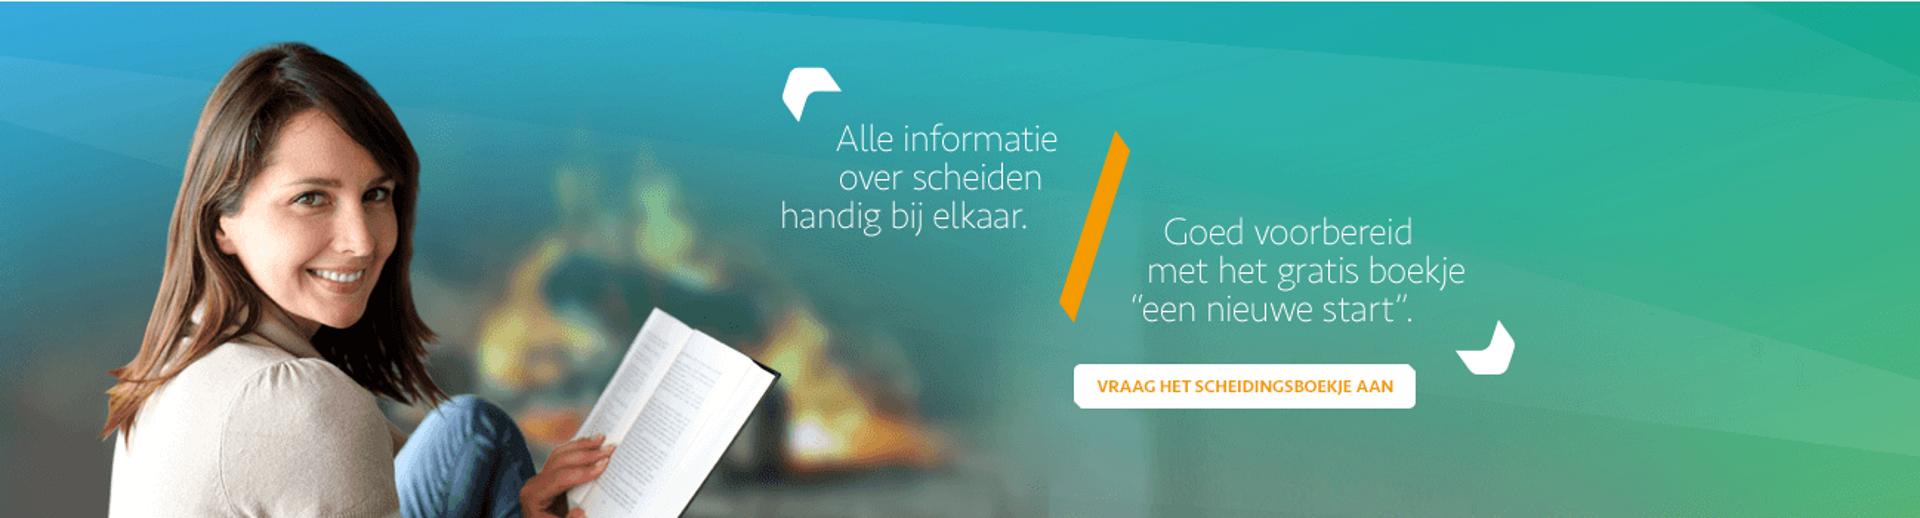 Gratis boekje over scheiden - Scheidingsplanner Almelo - Deventer - Nijverdal